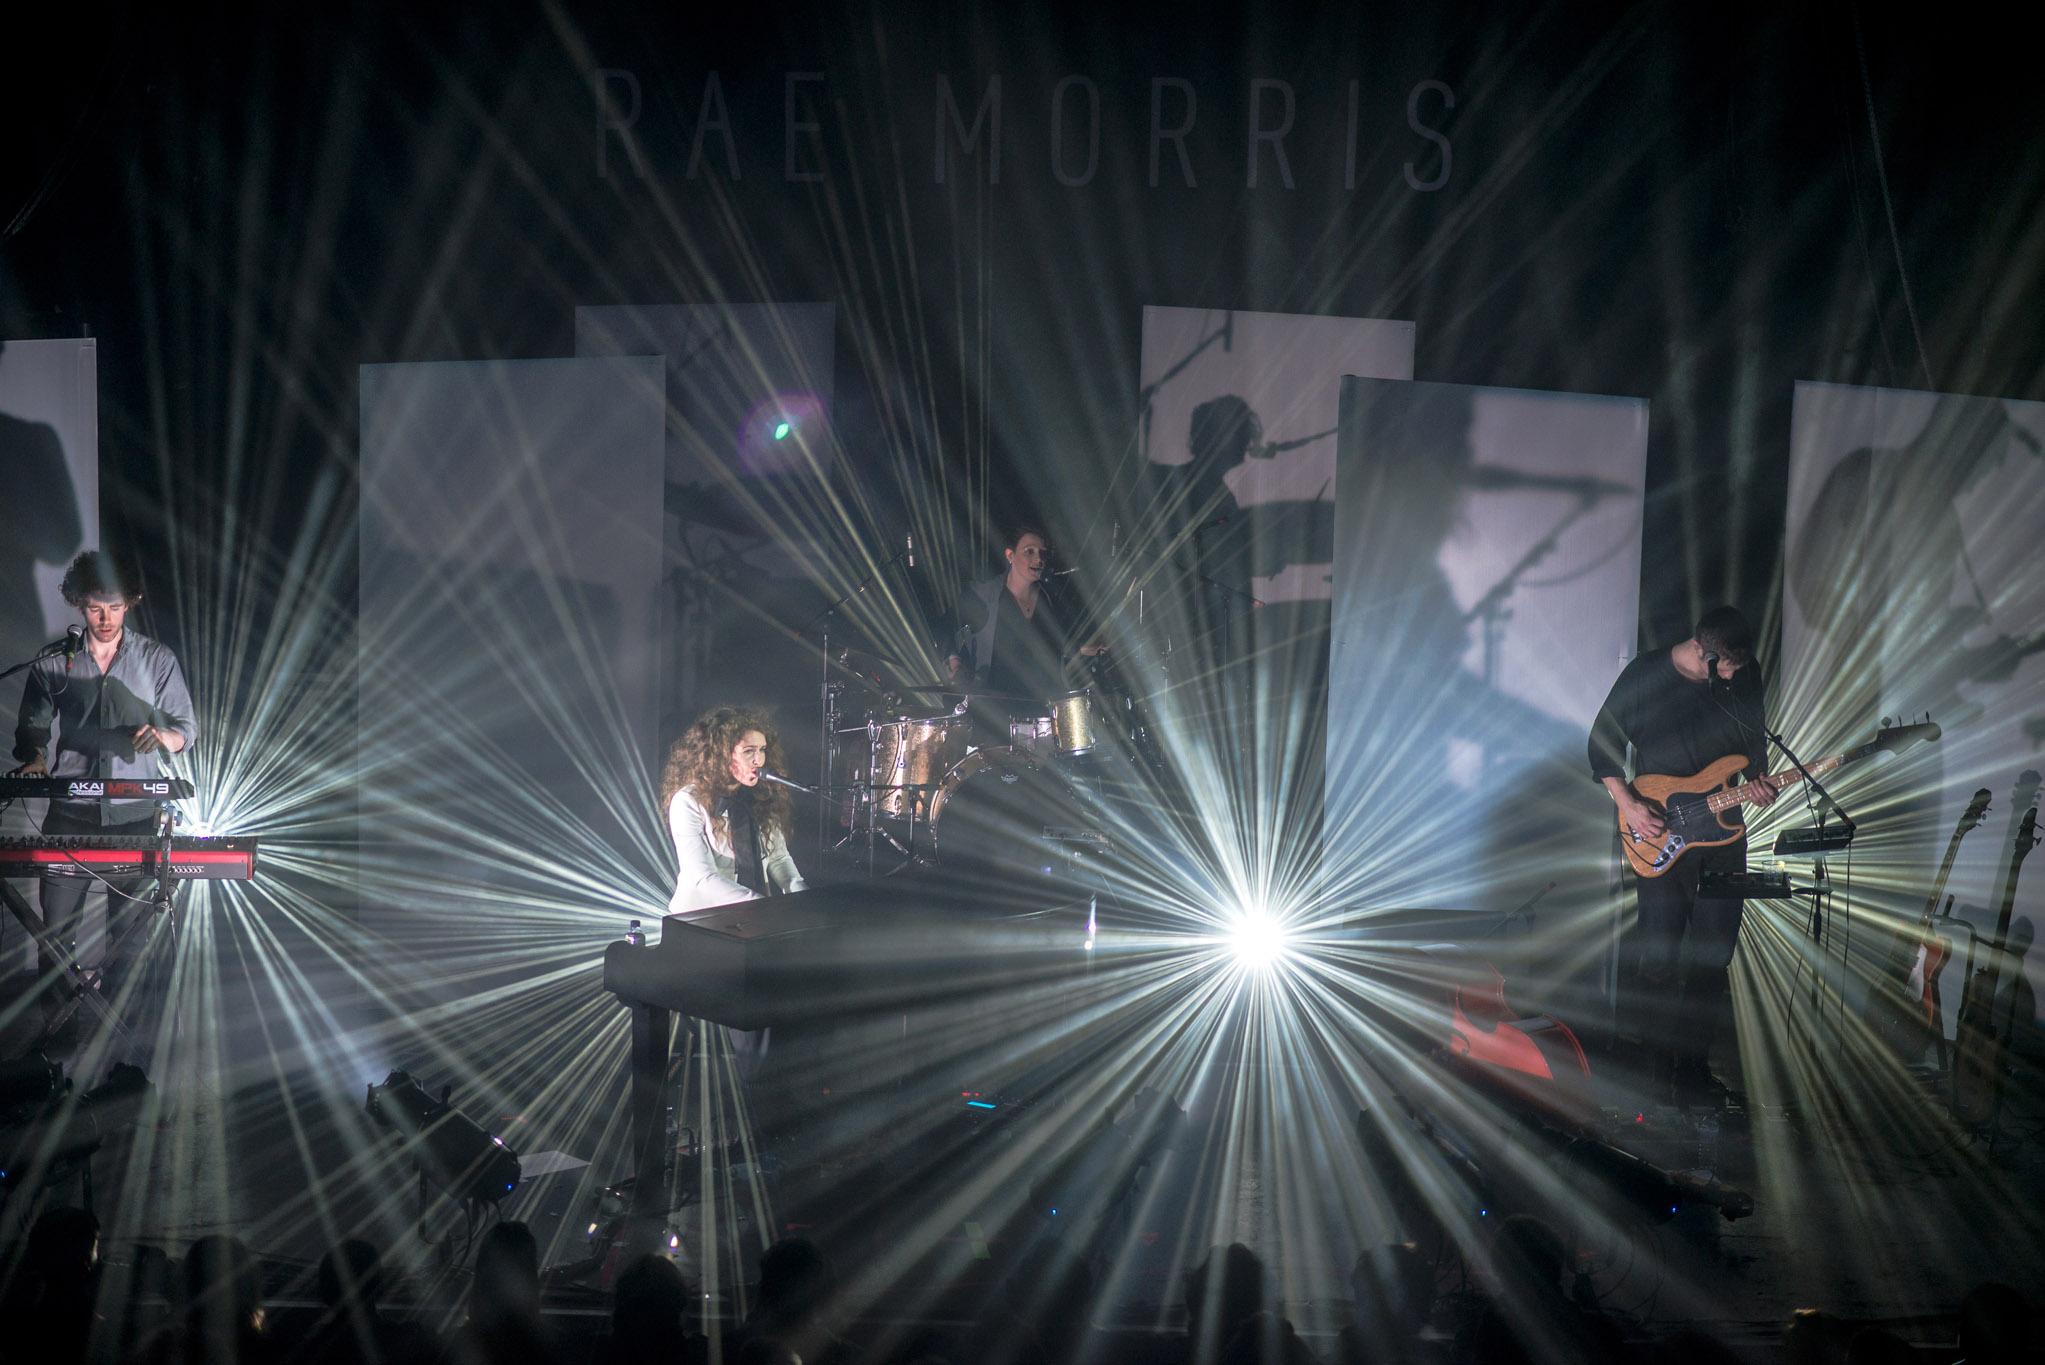 Rae Morris, Electric Brixton, London